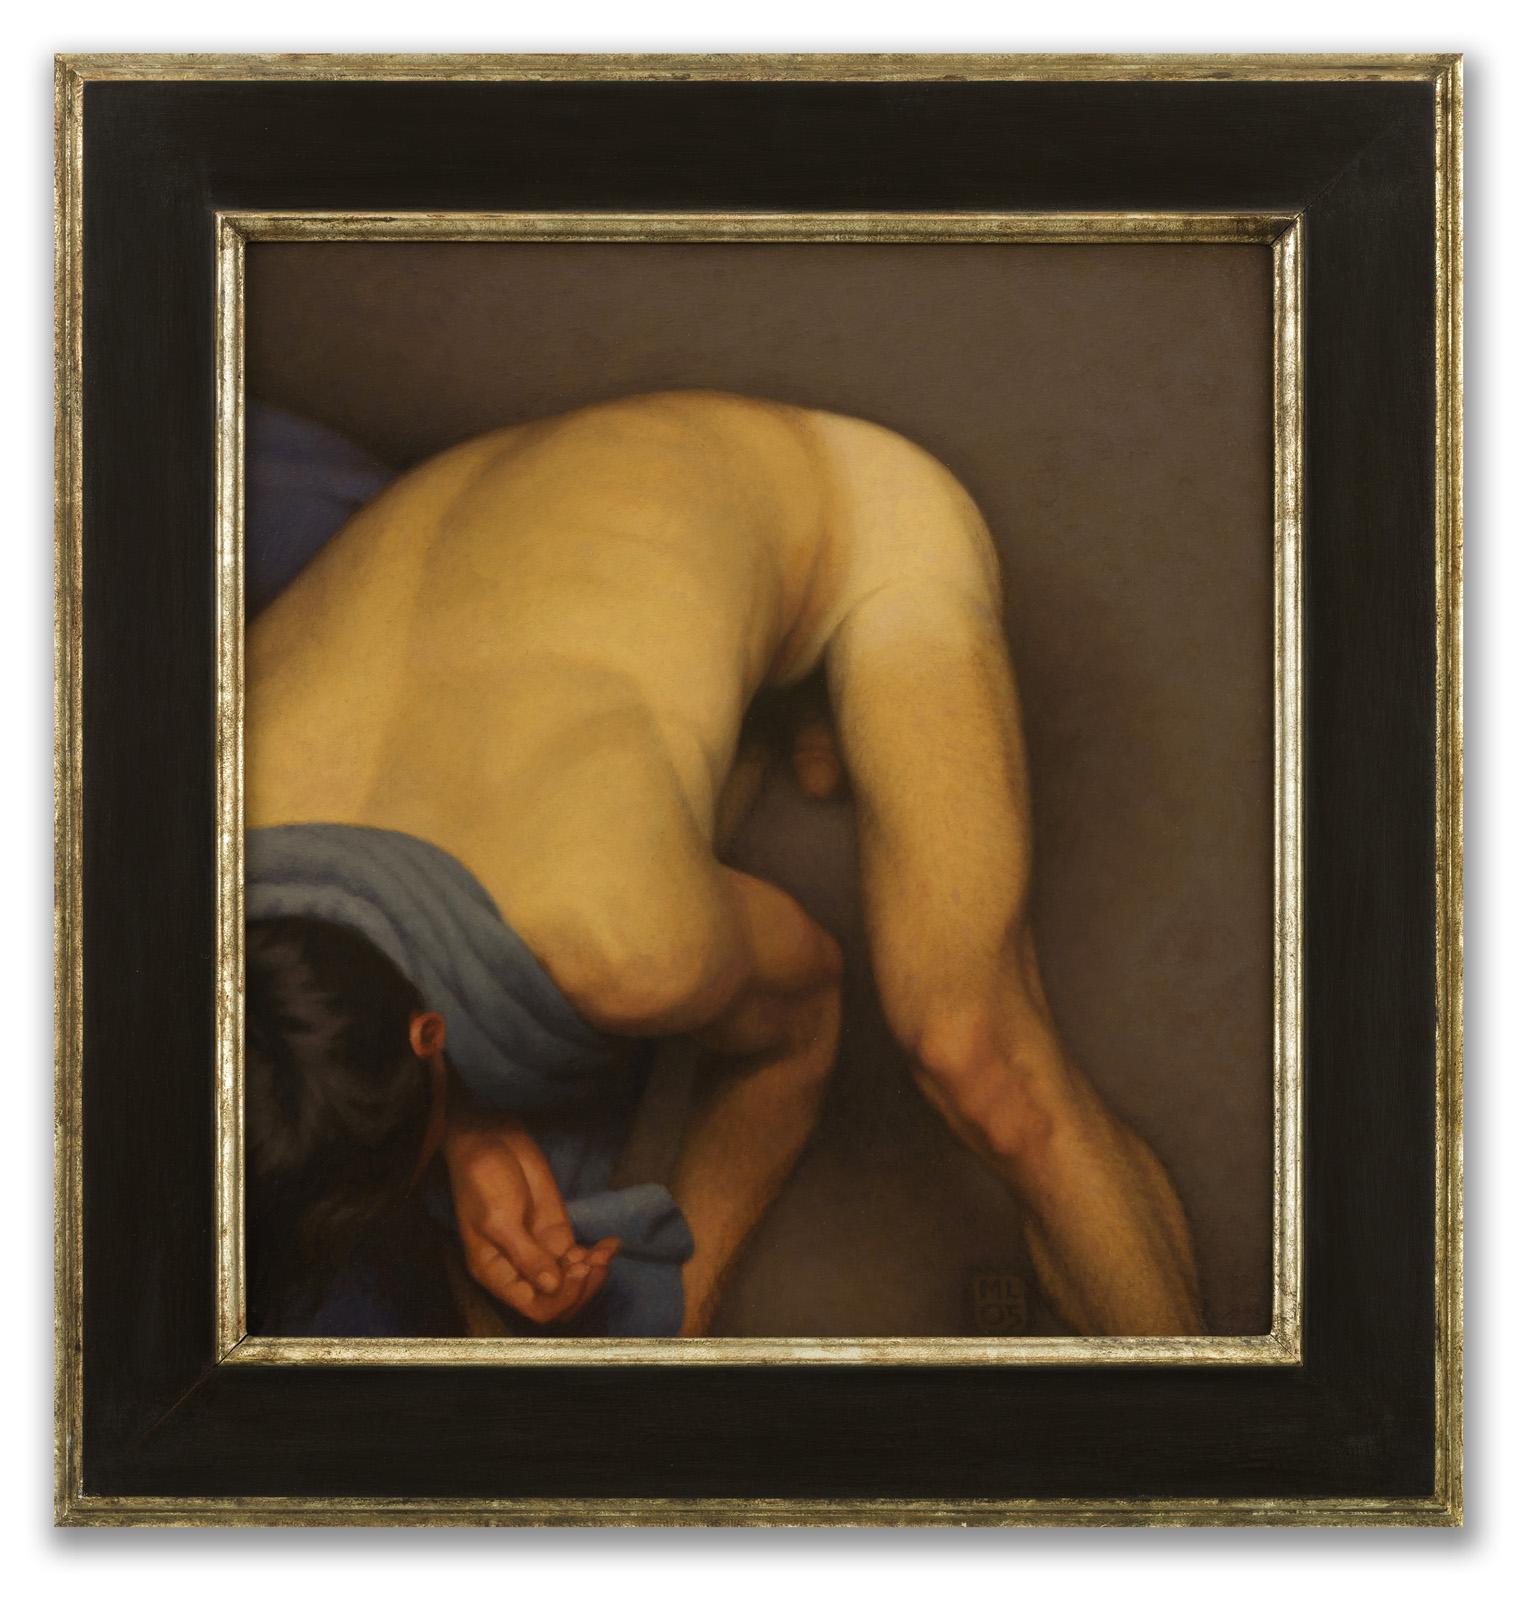 Michael Leonard, (British b.1933), Bather Stooping Low, 2005.